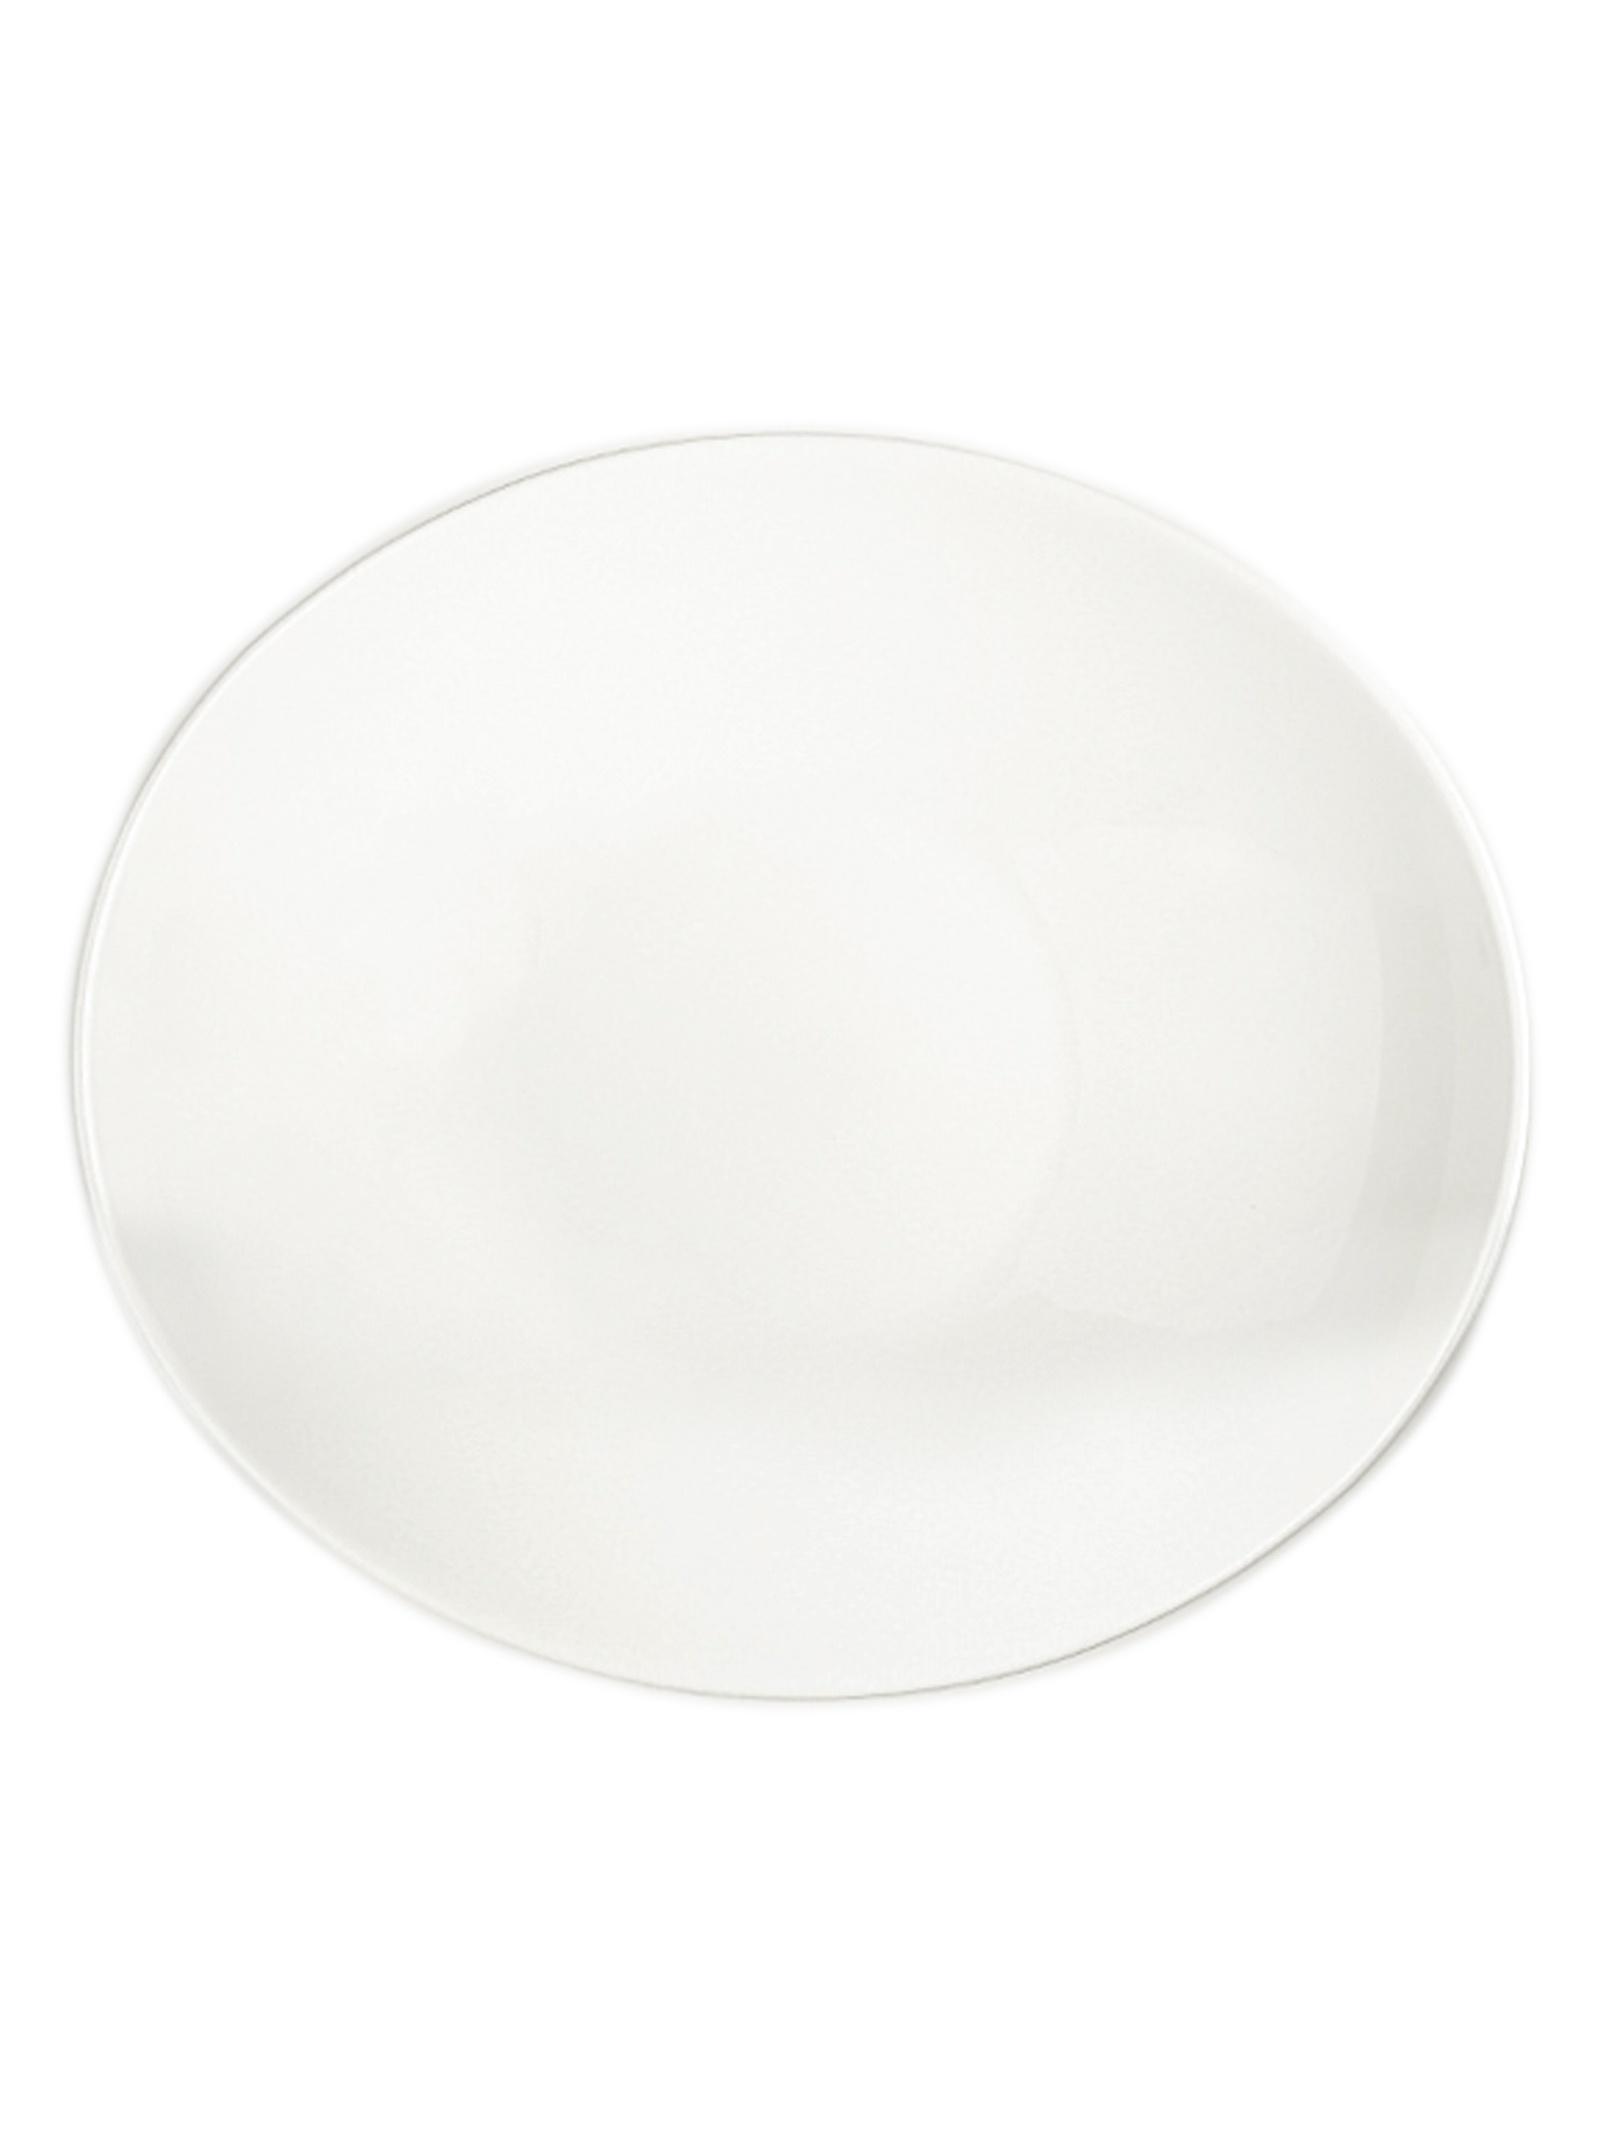 Тарелка глубокая Коралл 947195, Стеклокерамика тарелка глубокая gotoff цвет фисташковый диаметр 18 5 см